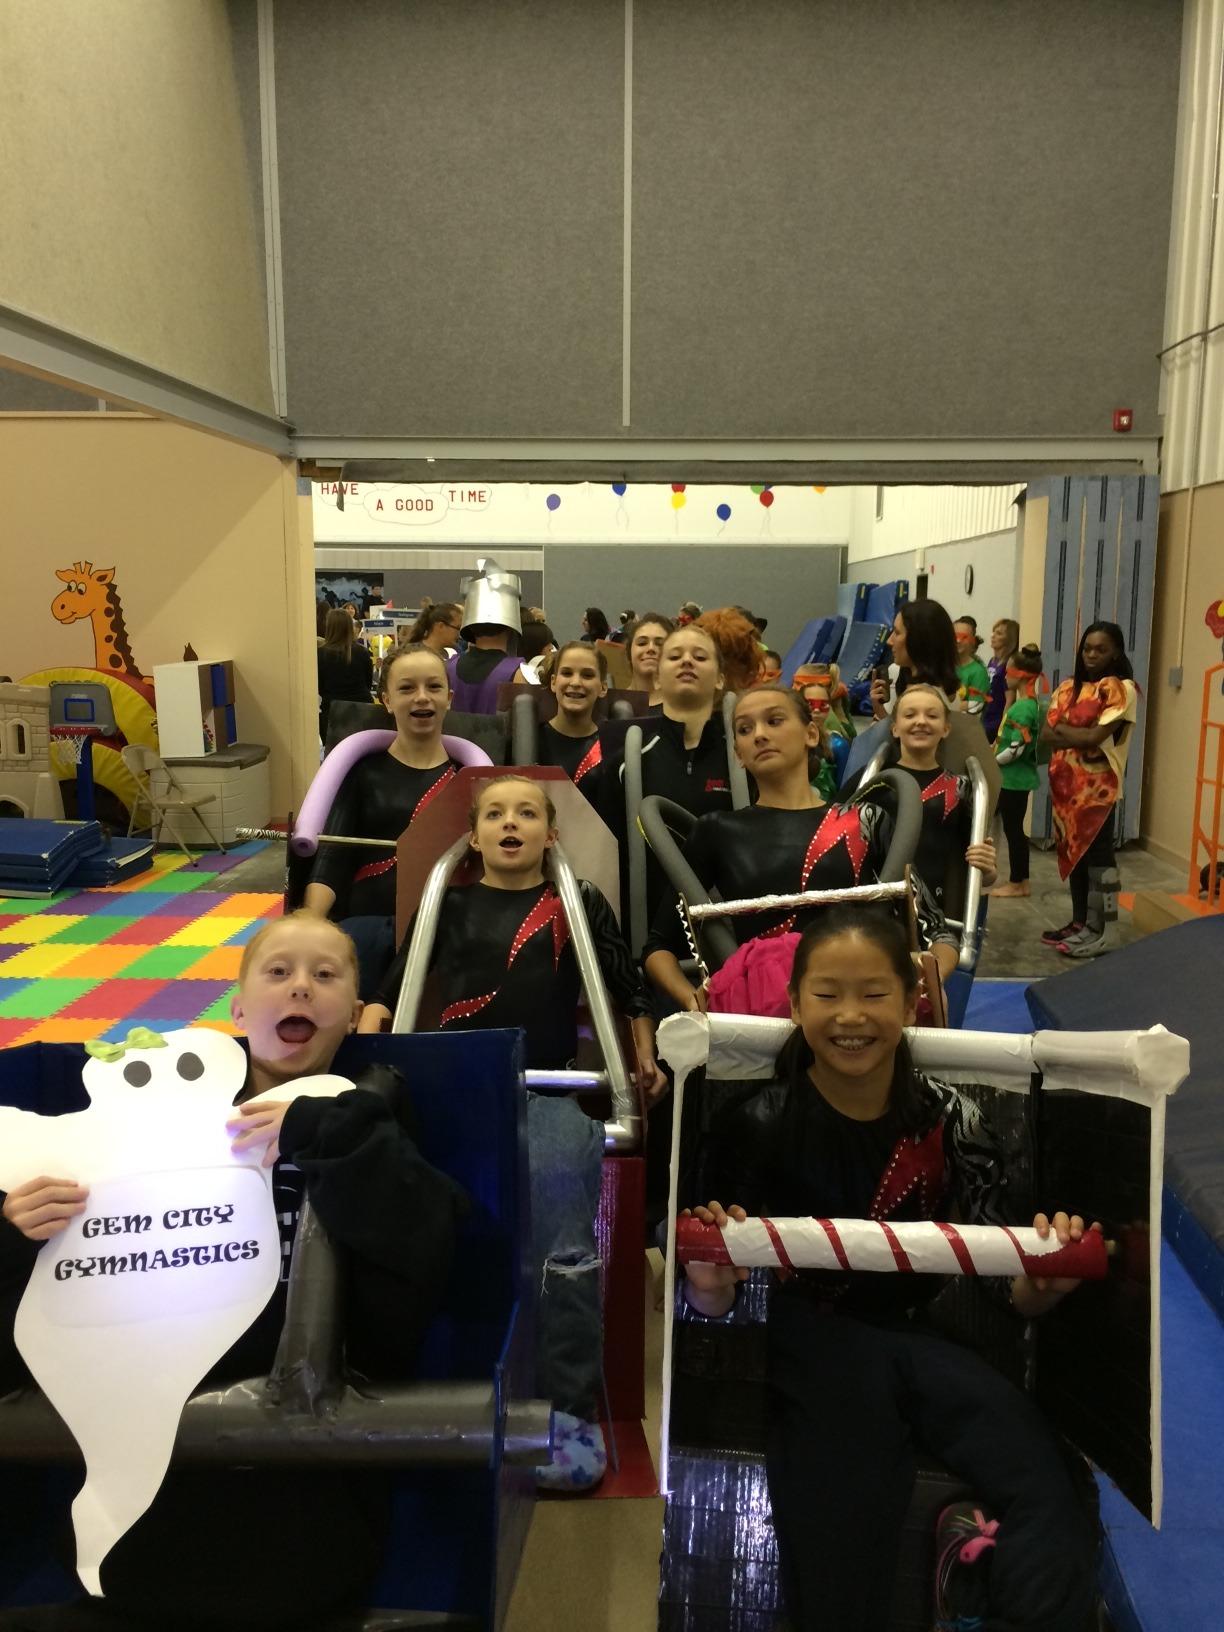 monster mash gymnastics meet results 2012